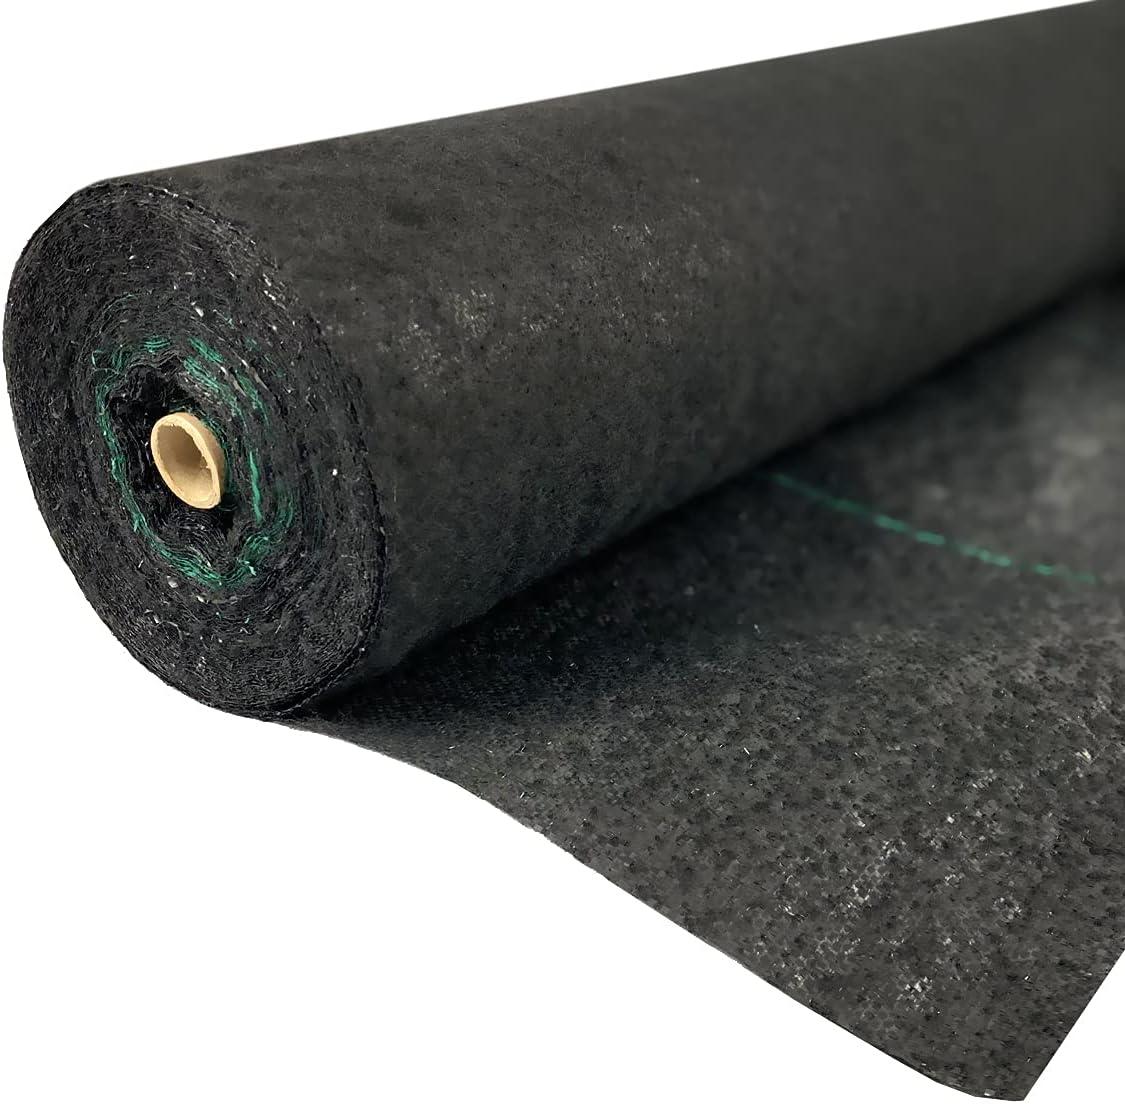 Ashman Landscape Fabric Weed Blocking x Heavy-Duty Mat Albuquerque Mall Max 62% OFF 100' 4'